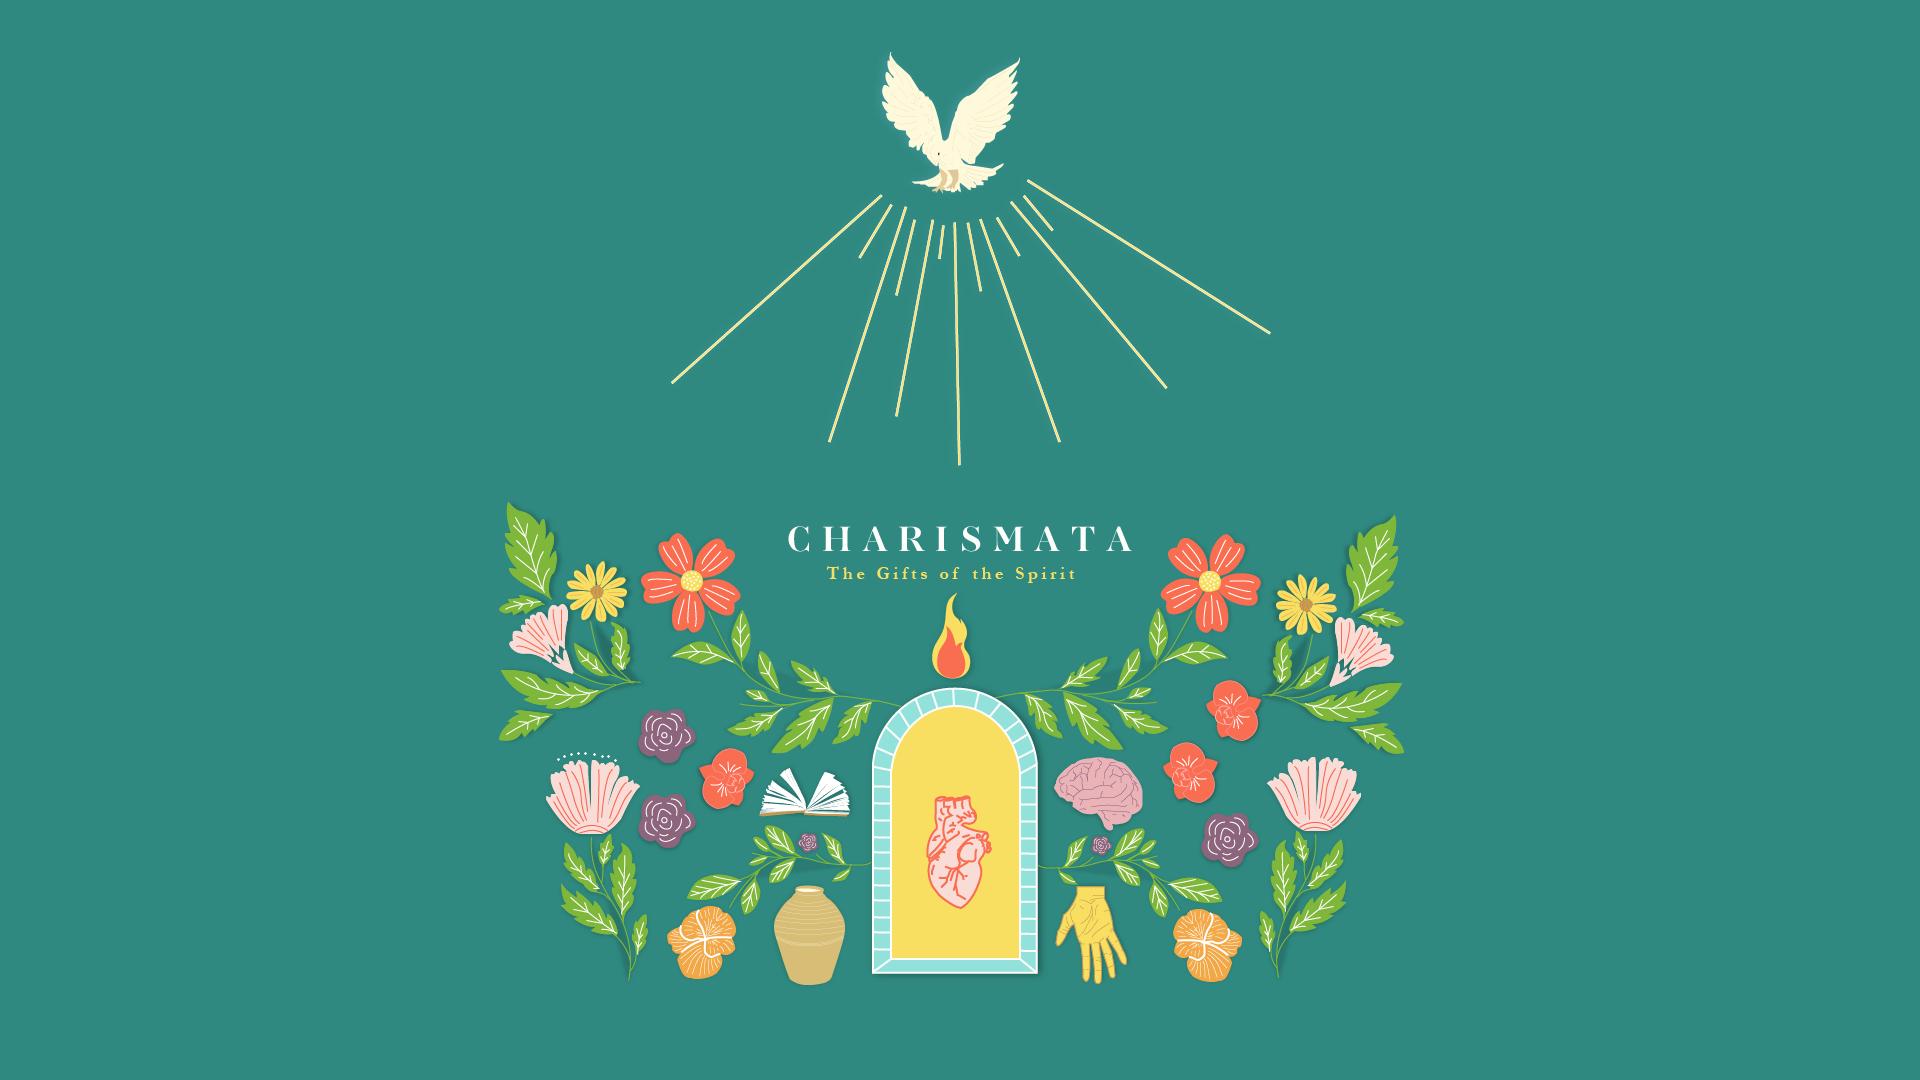 Charismata